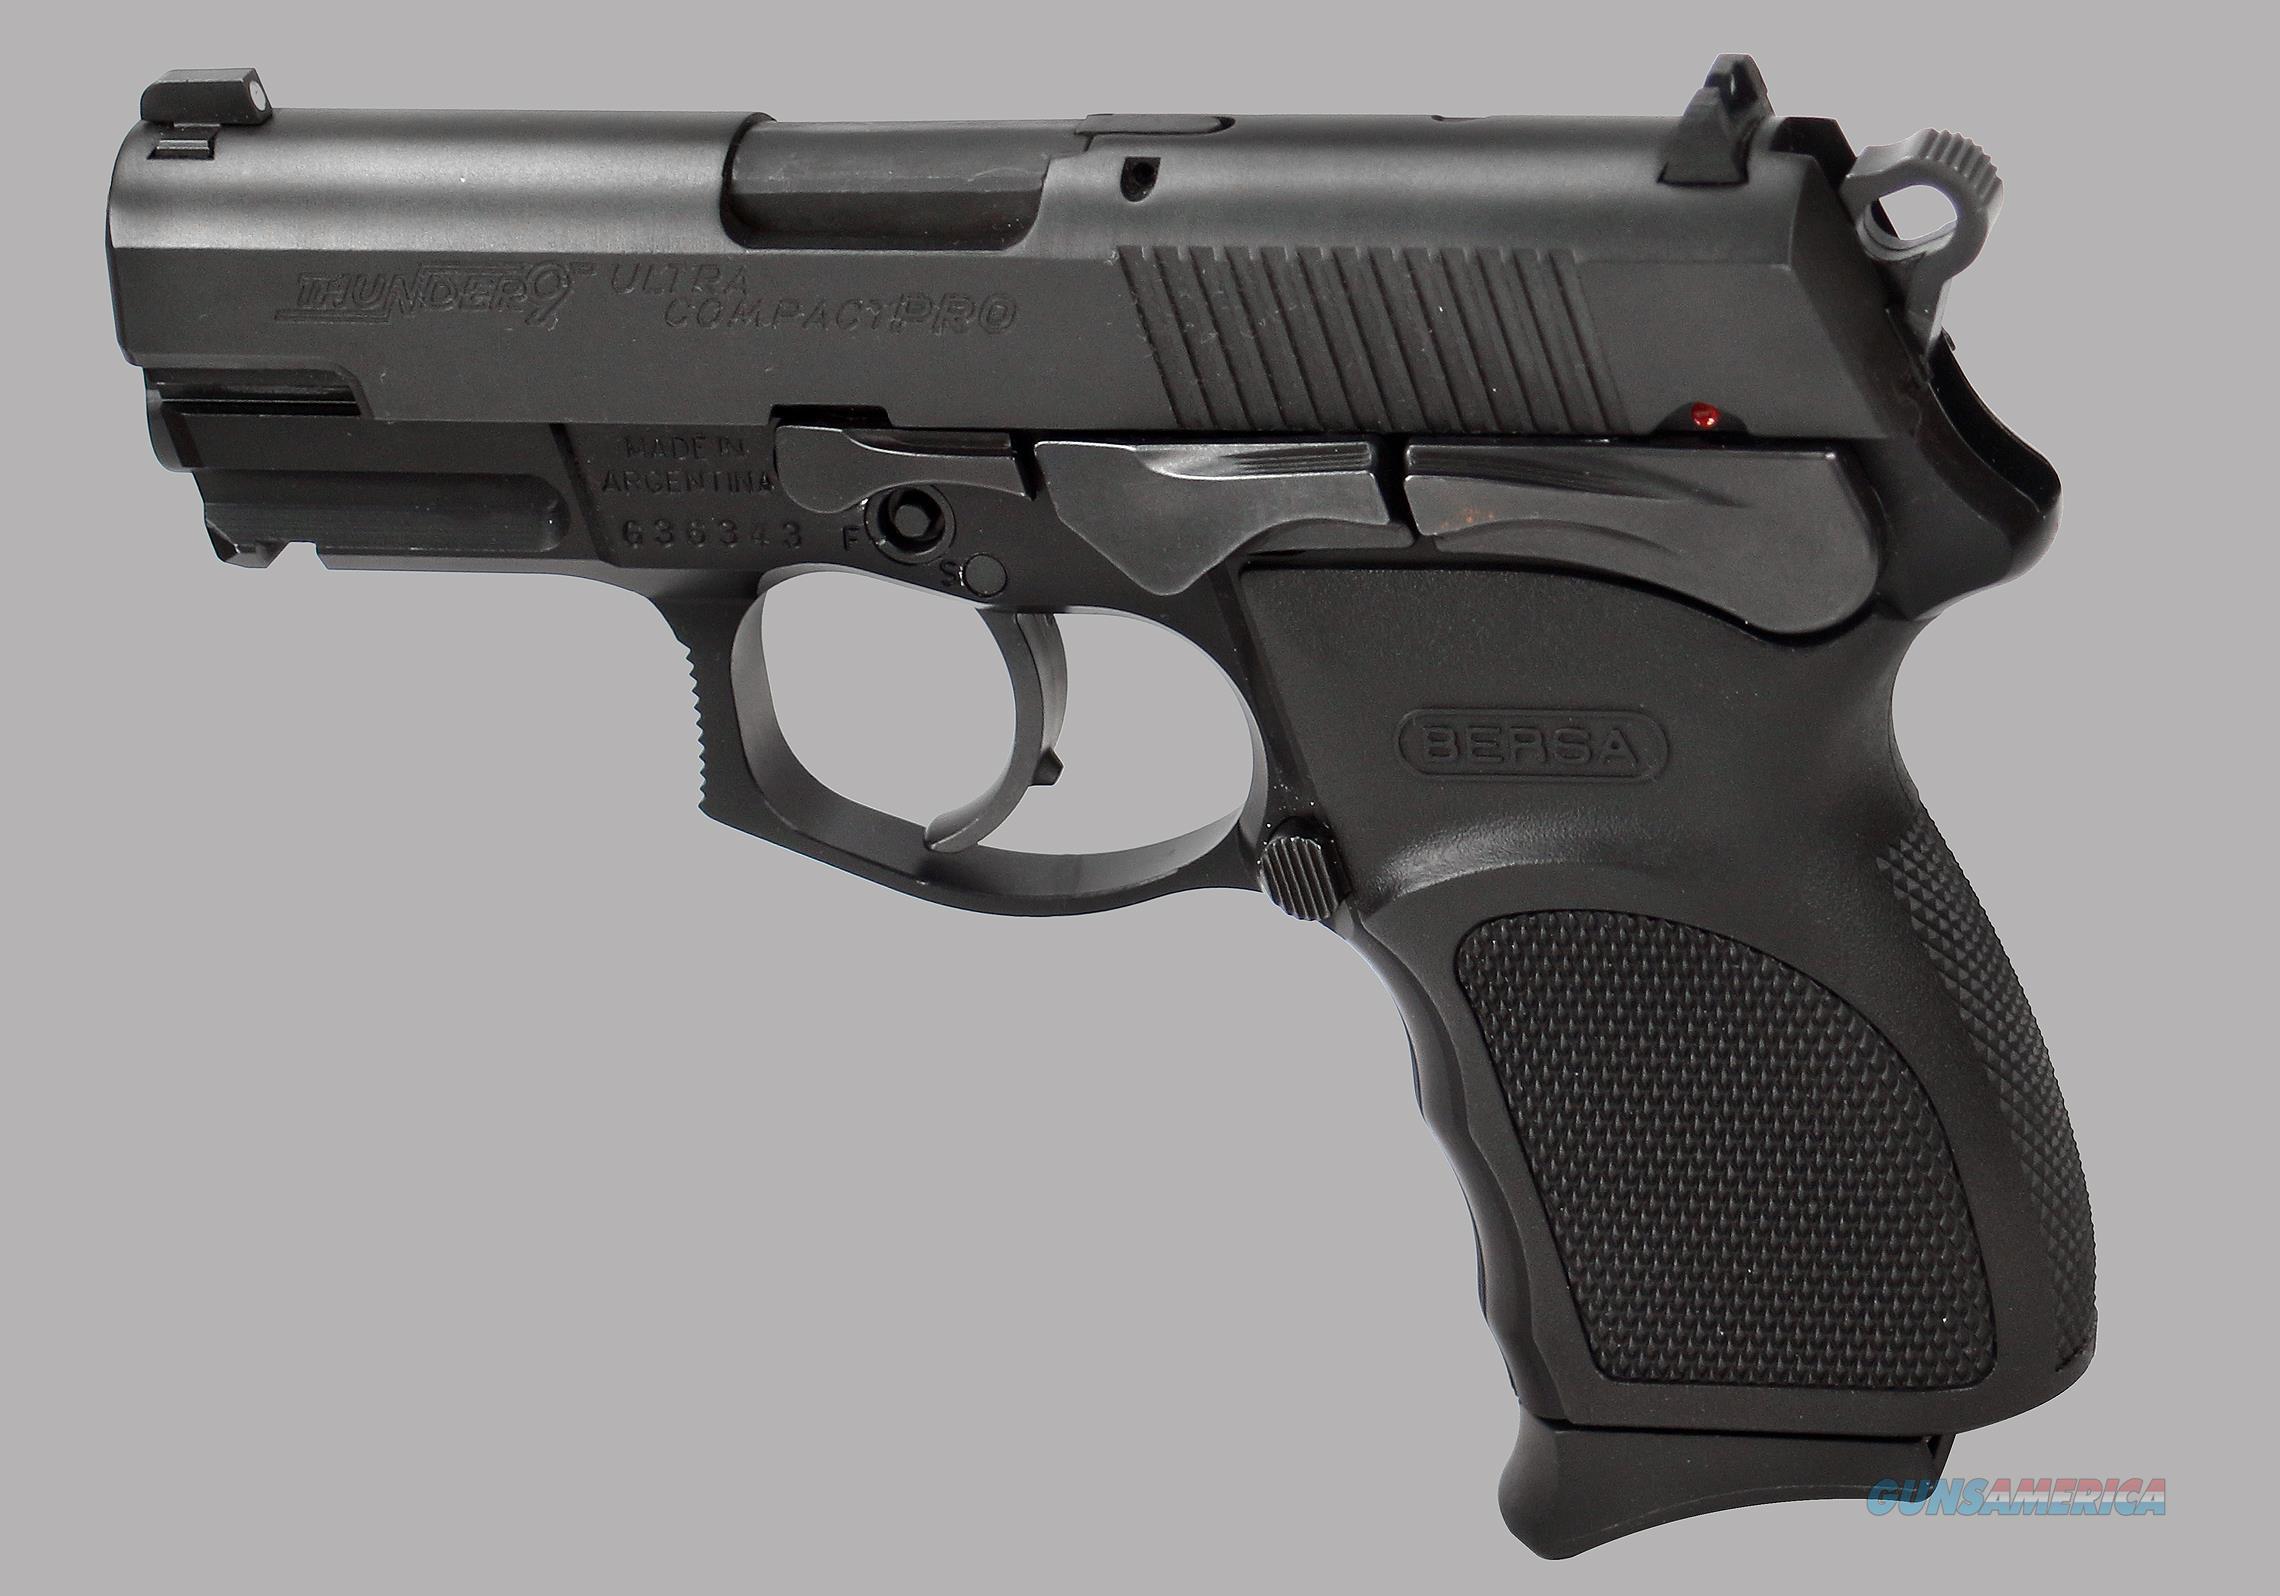 Bersa/R S A  9mm Thunder 9 Ultra Compact Pro Pistol